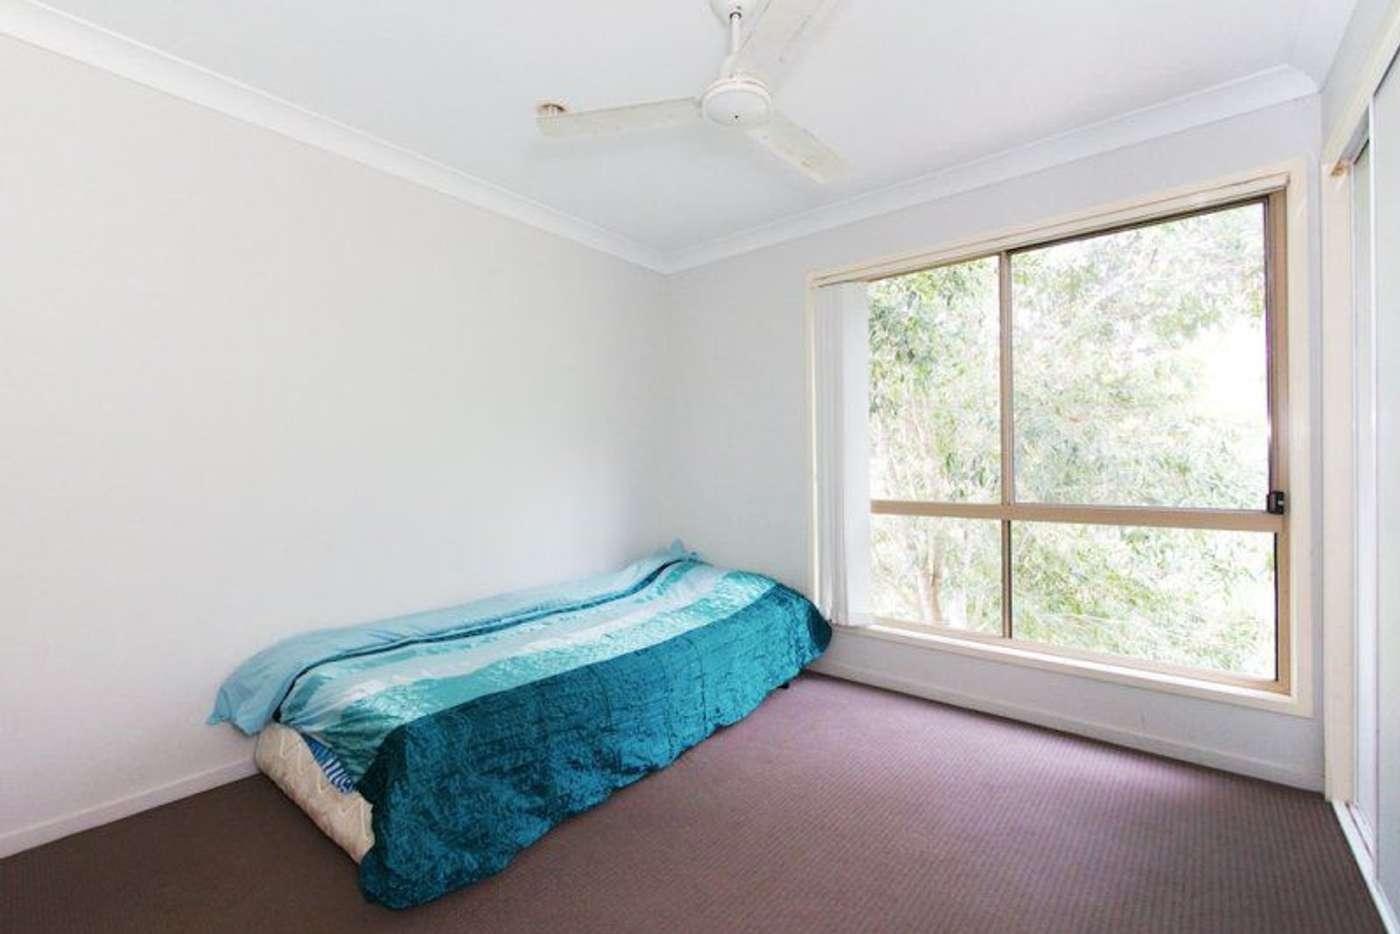 Sixth view of Homely townhouse listing, U24/36 Rushton Street, Runcorn QLD 4113